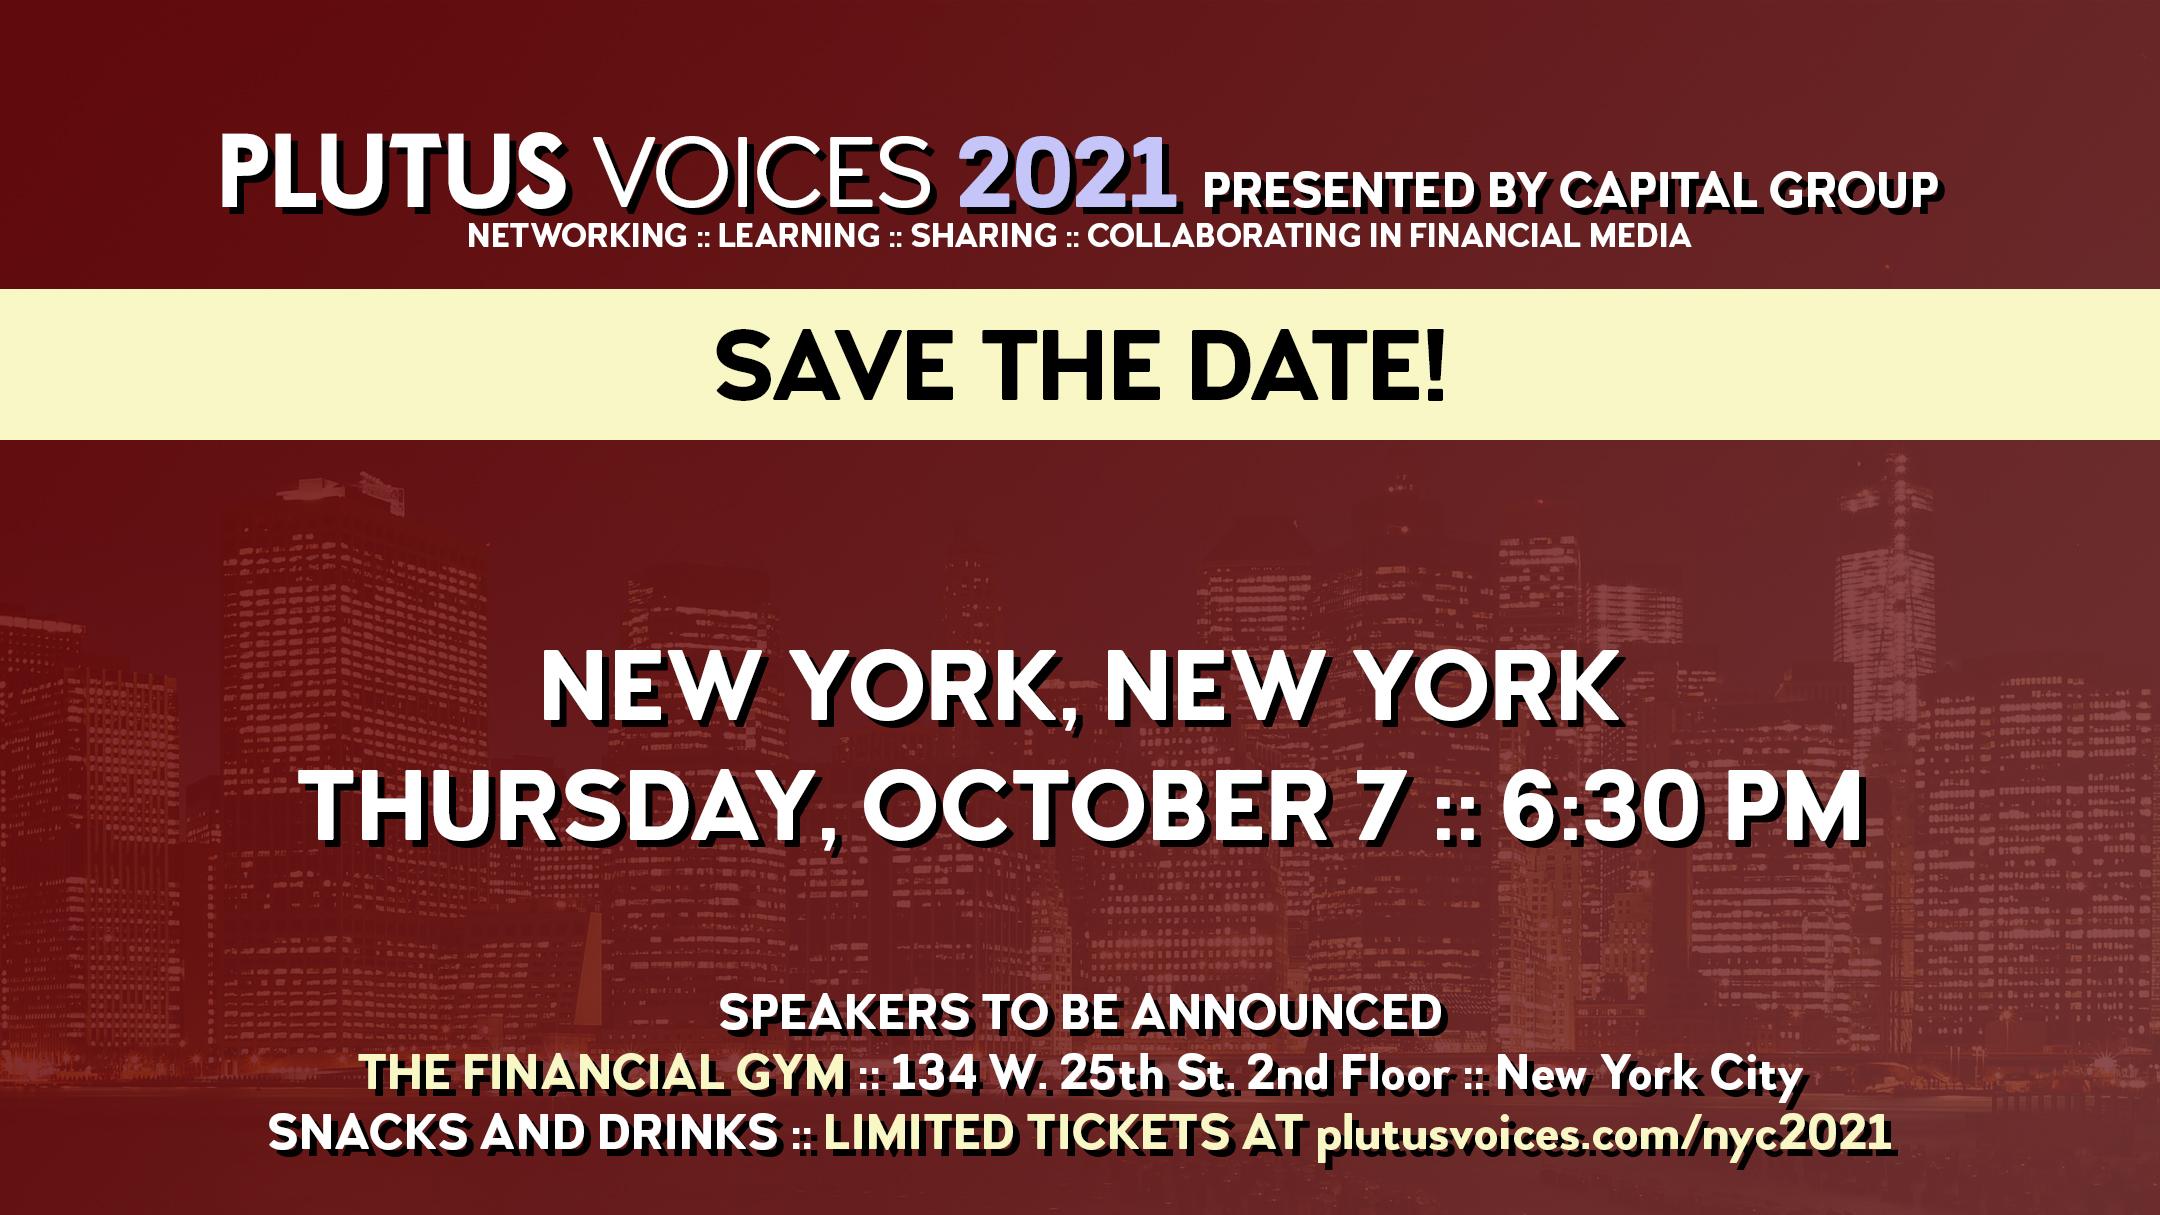 Plutus Voices New York City 2021